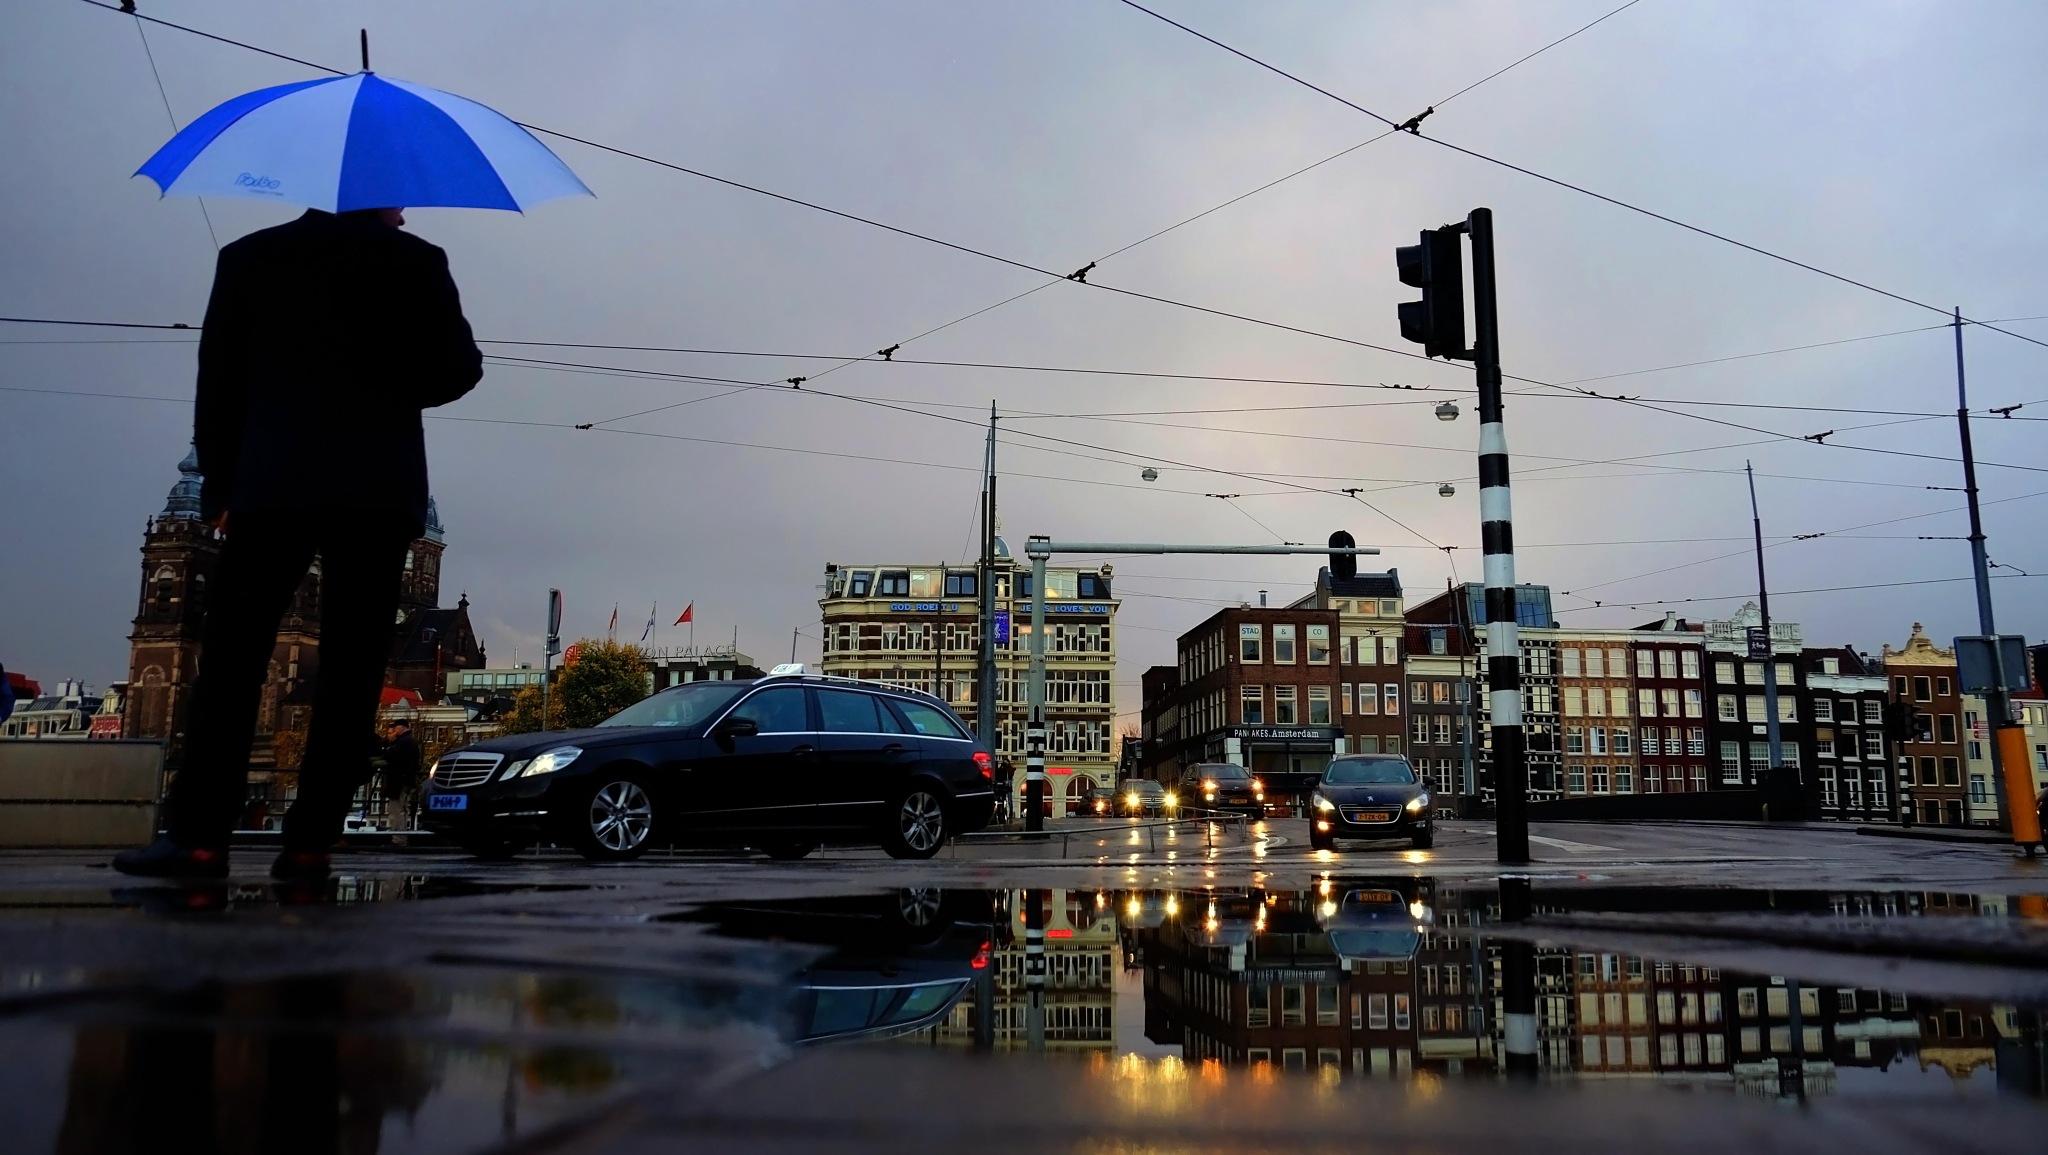 Amsterdam by tayfun Karahasan